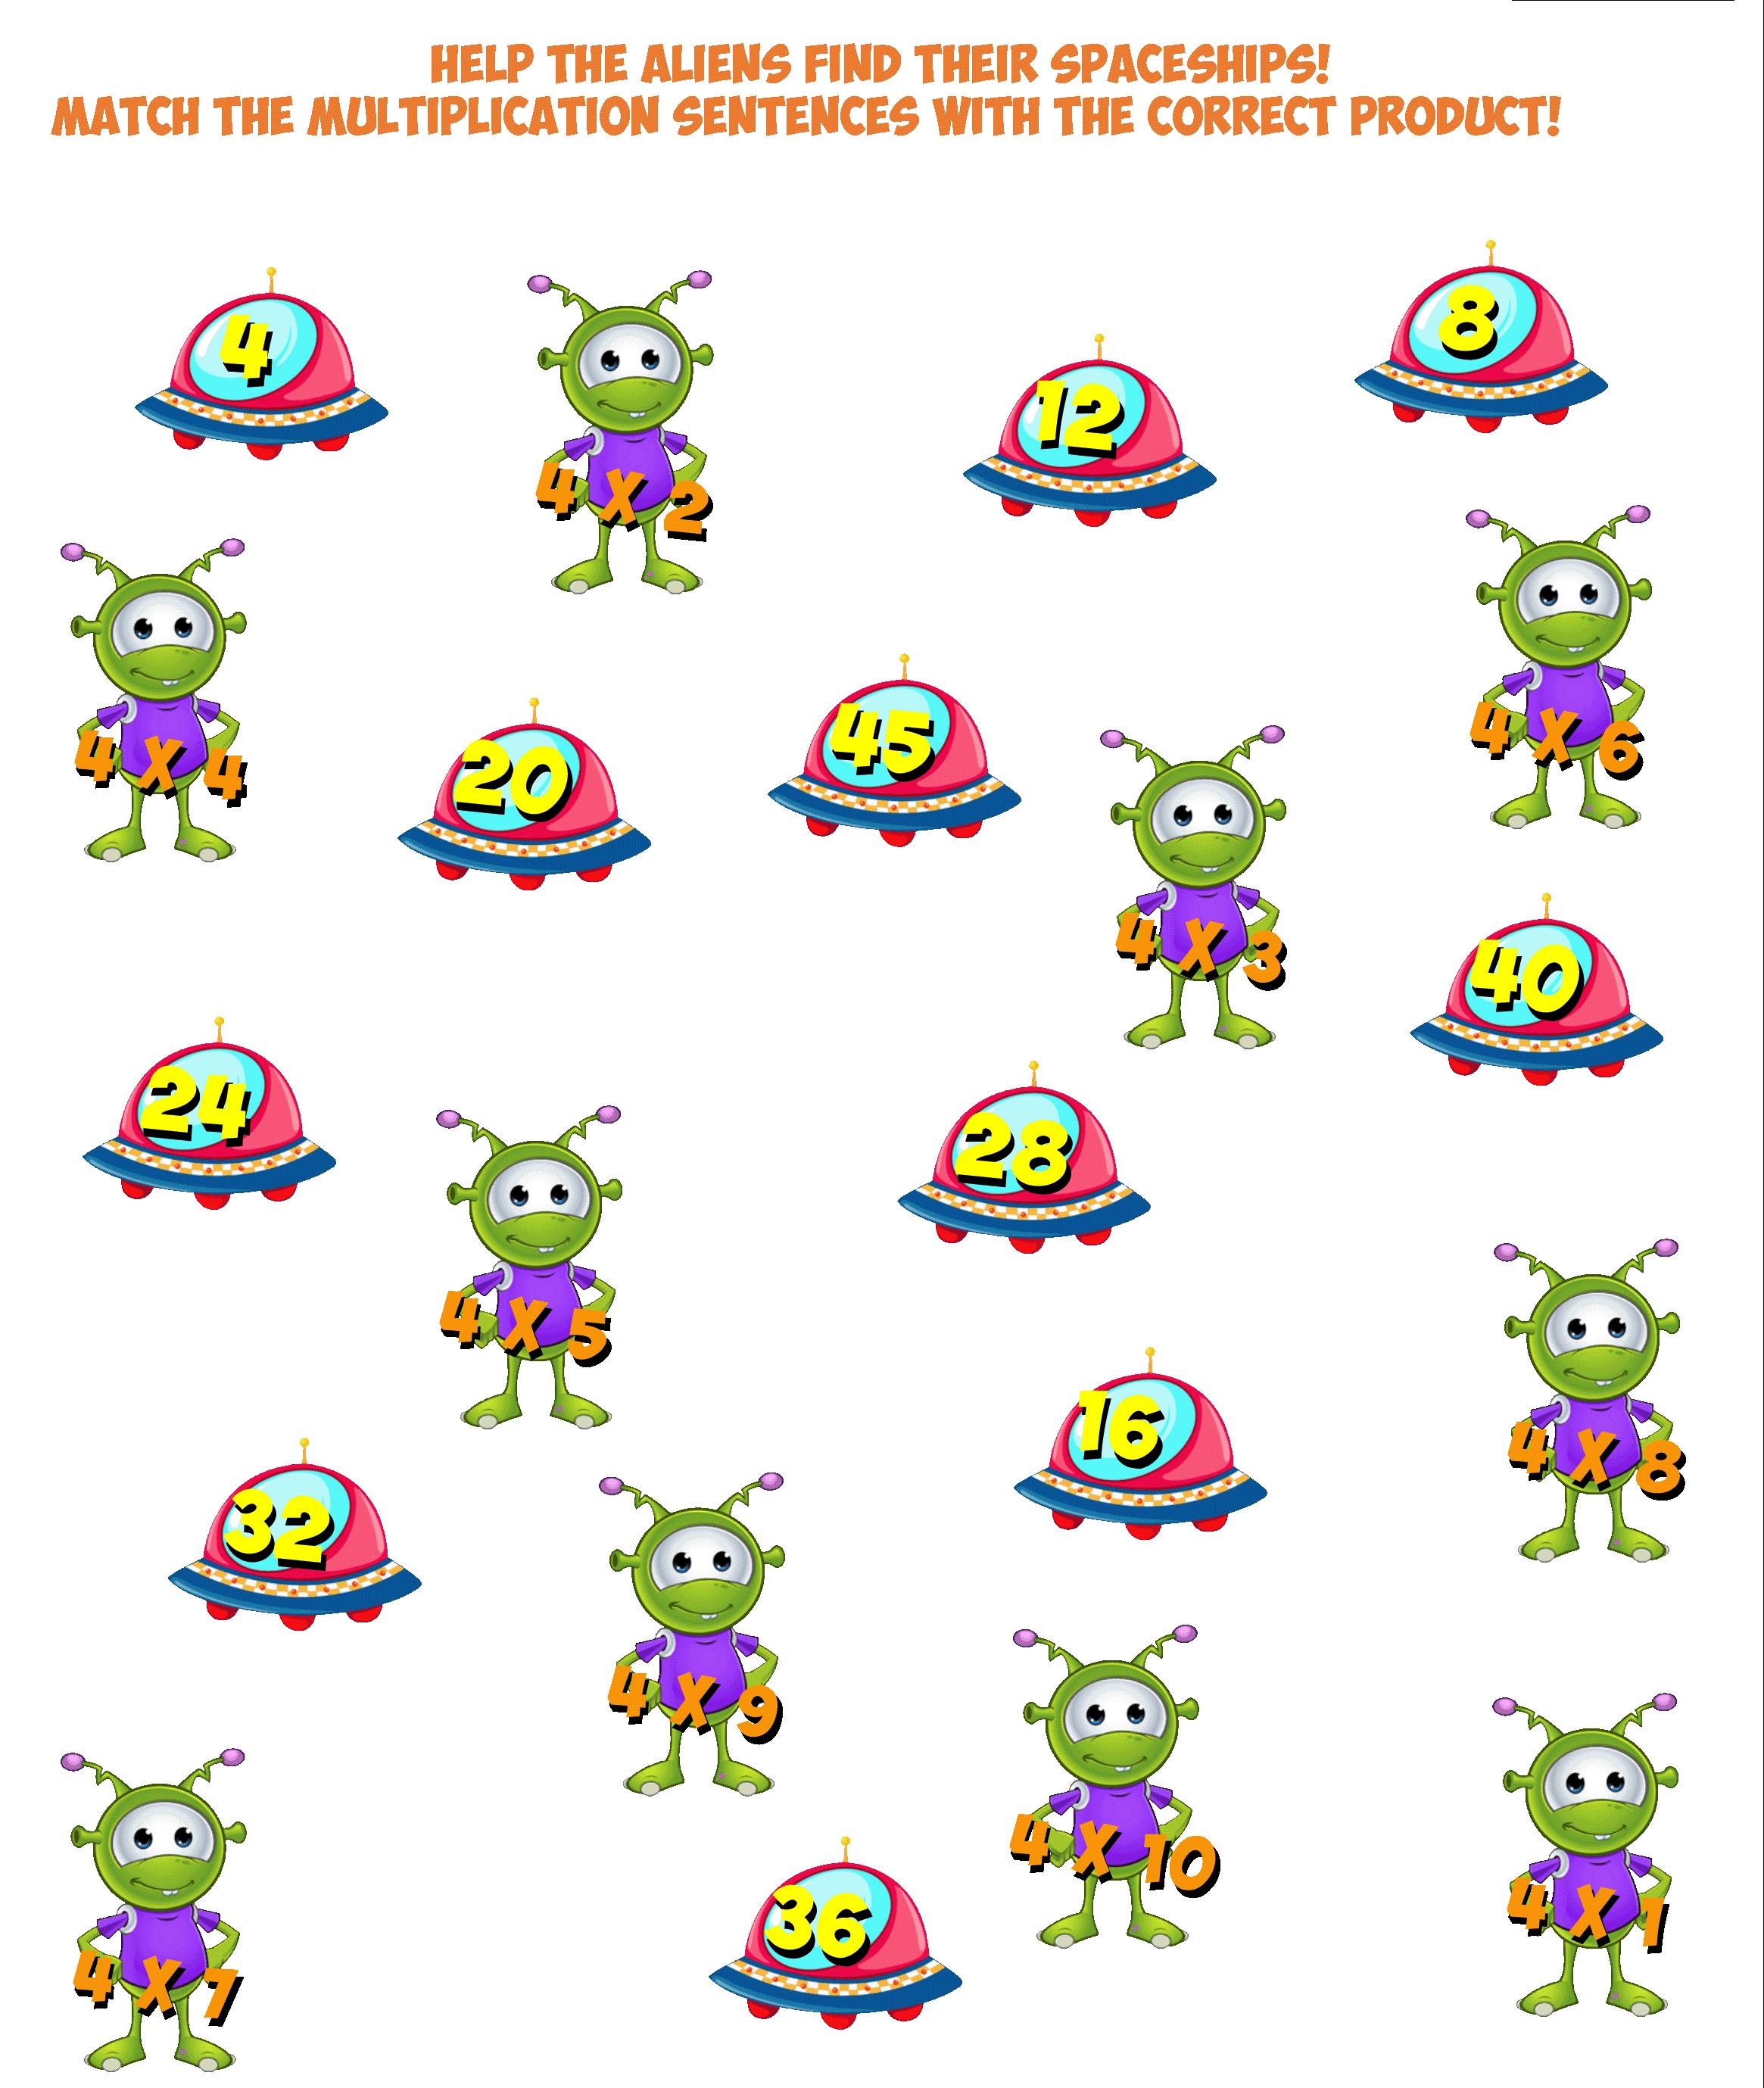 alien match multiples of 4